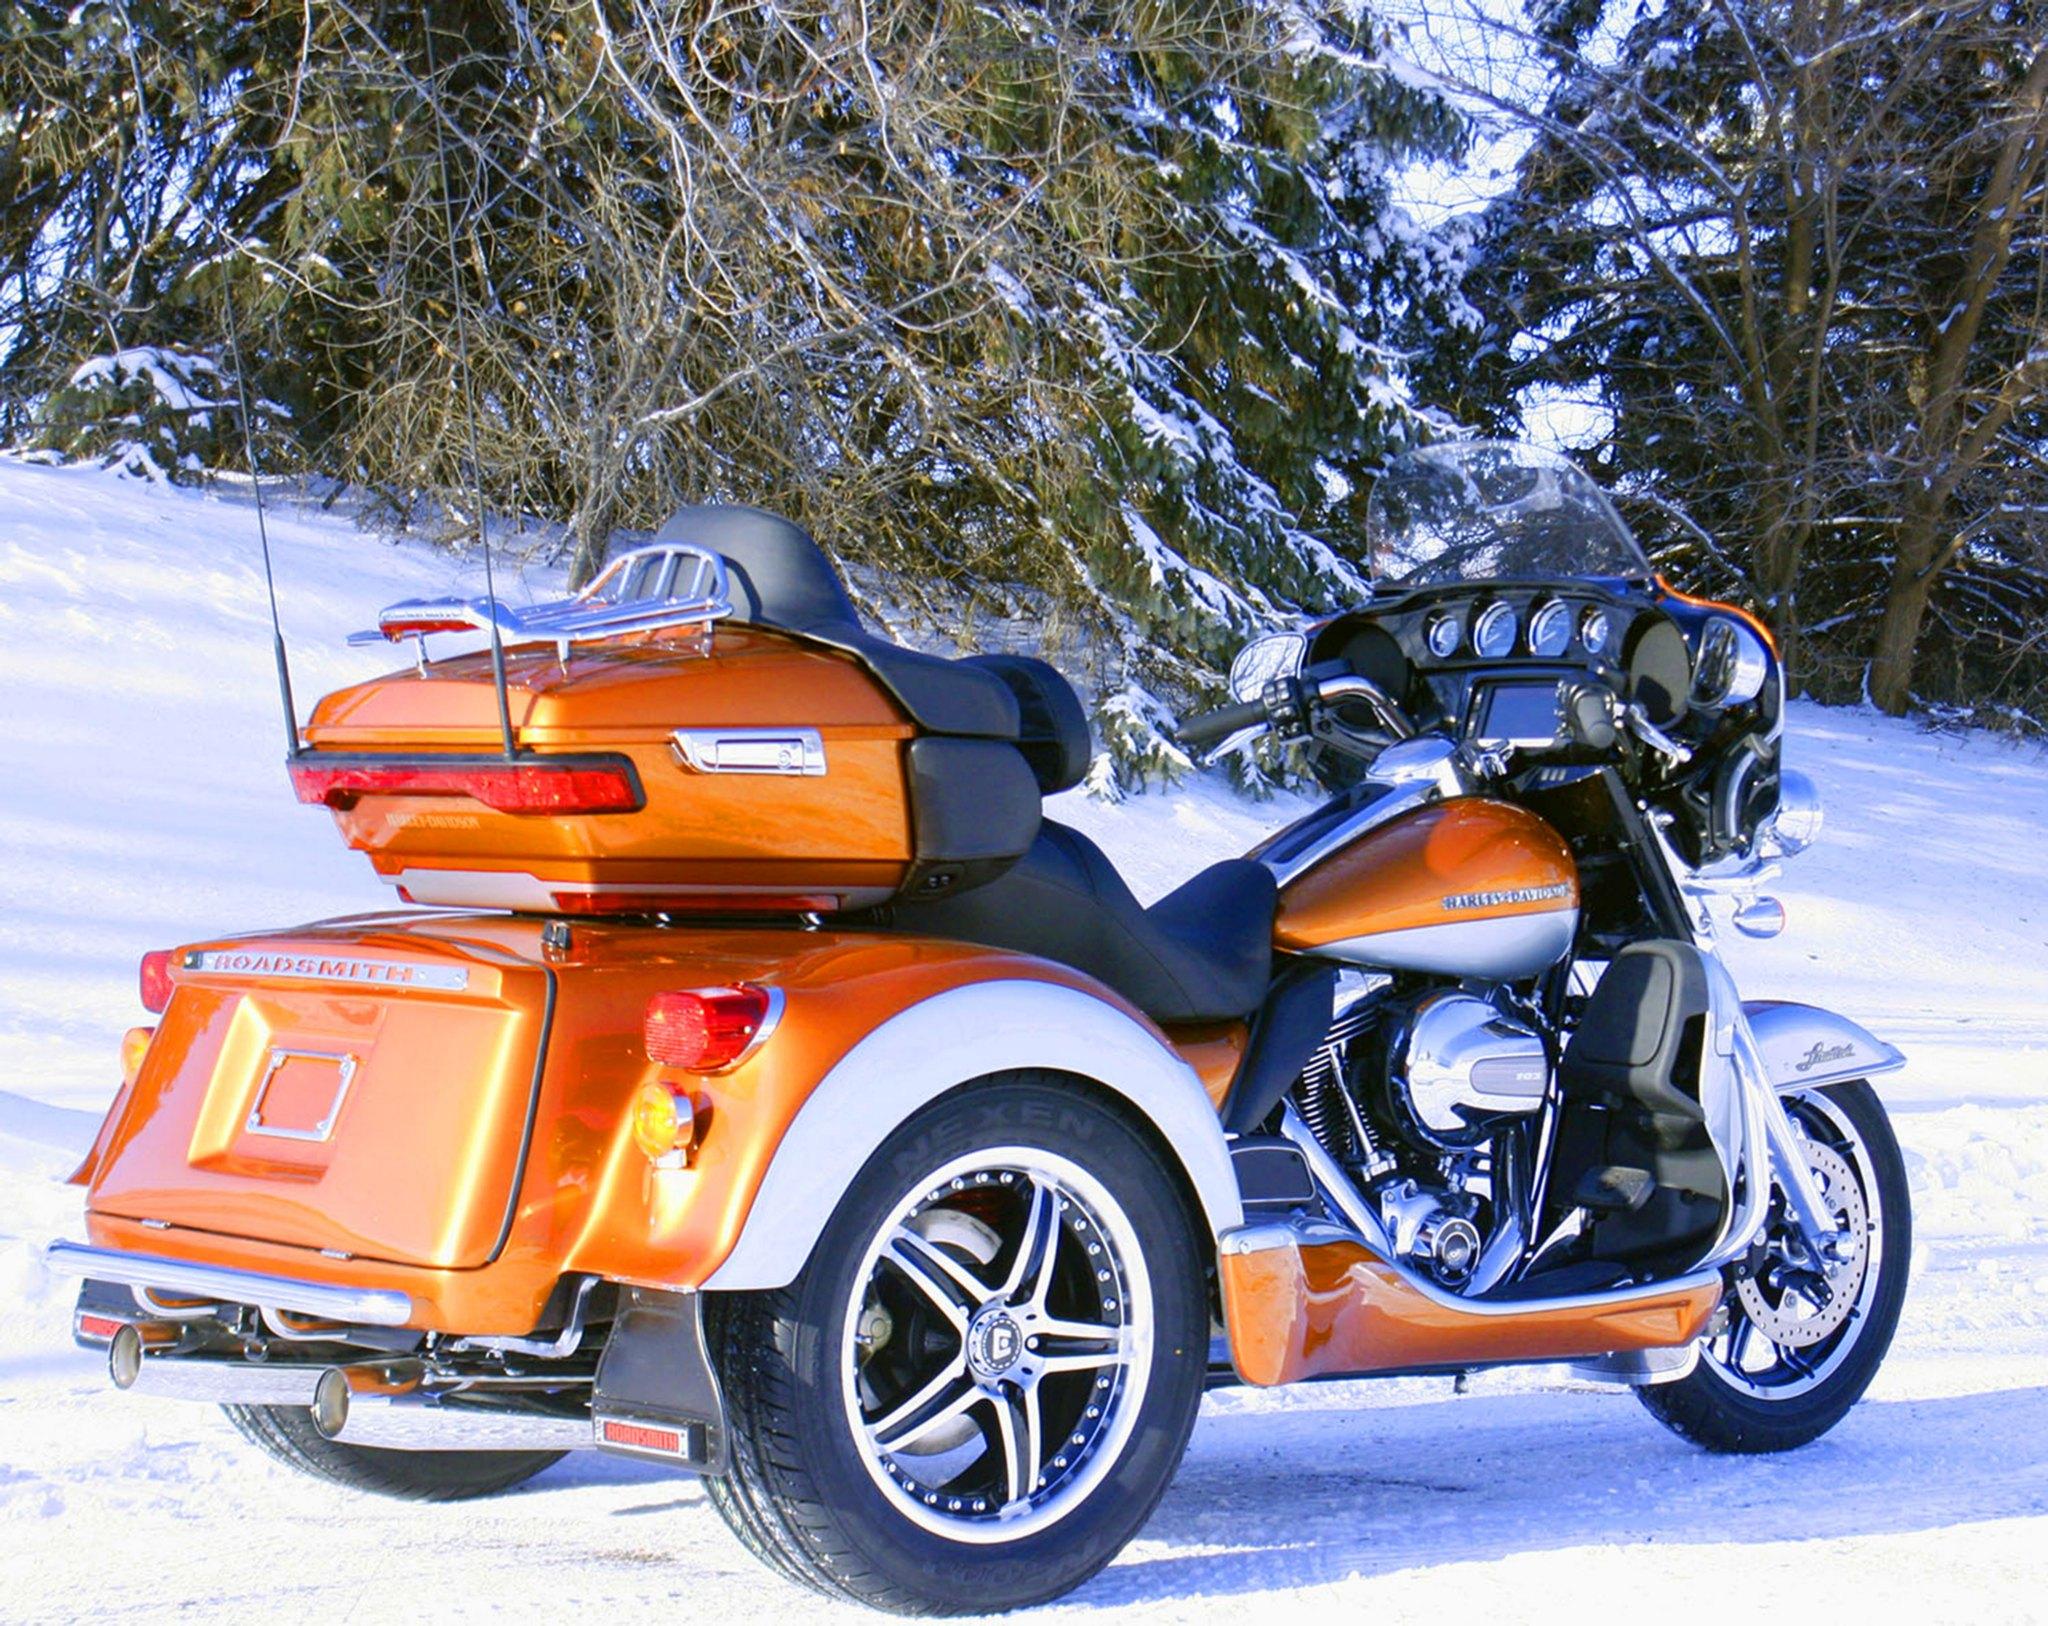 Roadsmith Introduces Harley-Davidson Rushmore Trikes